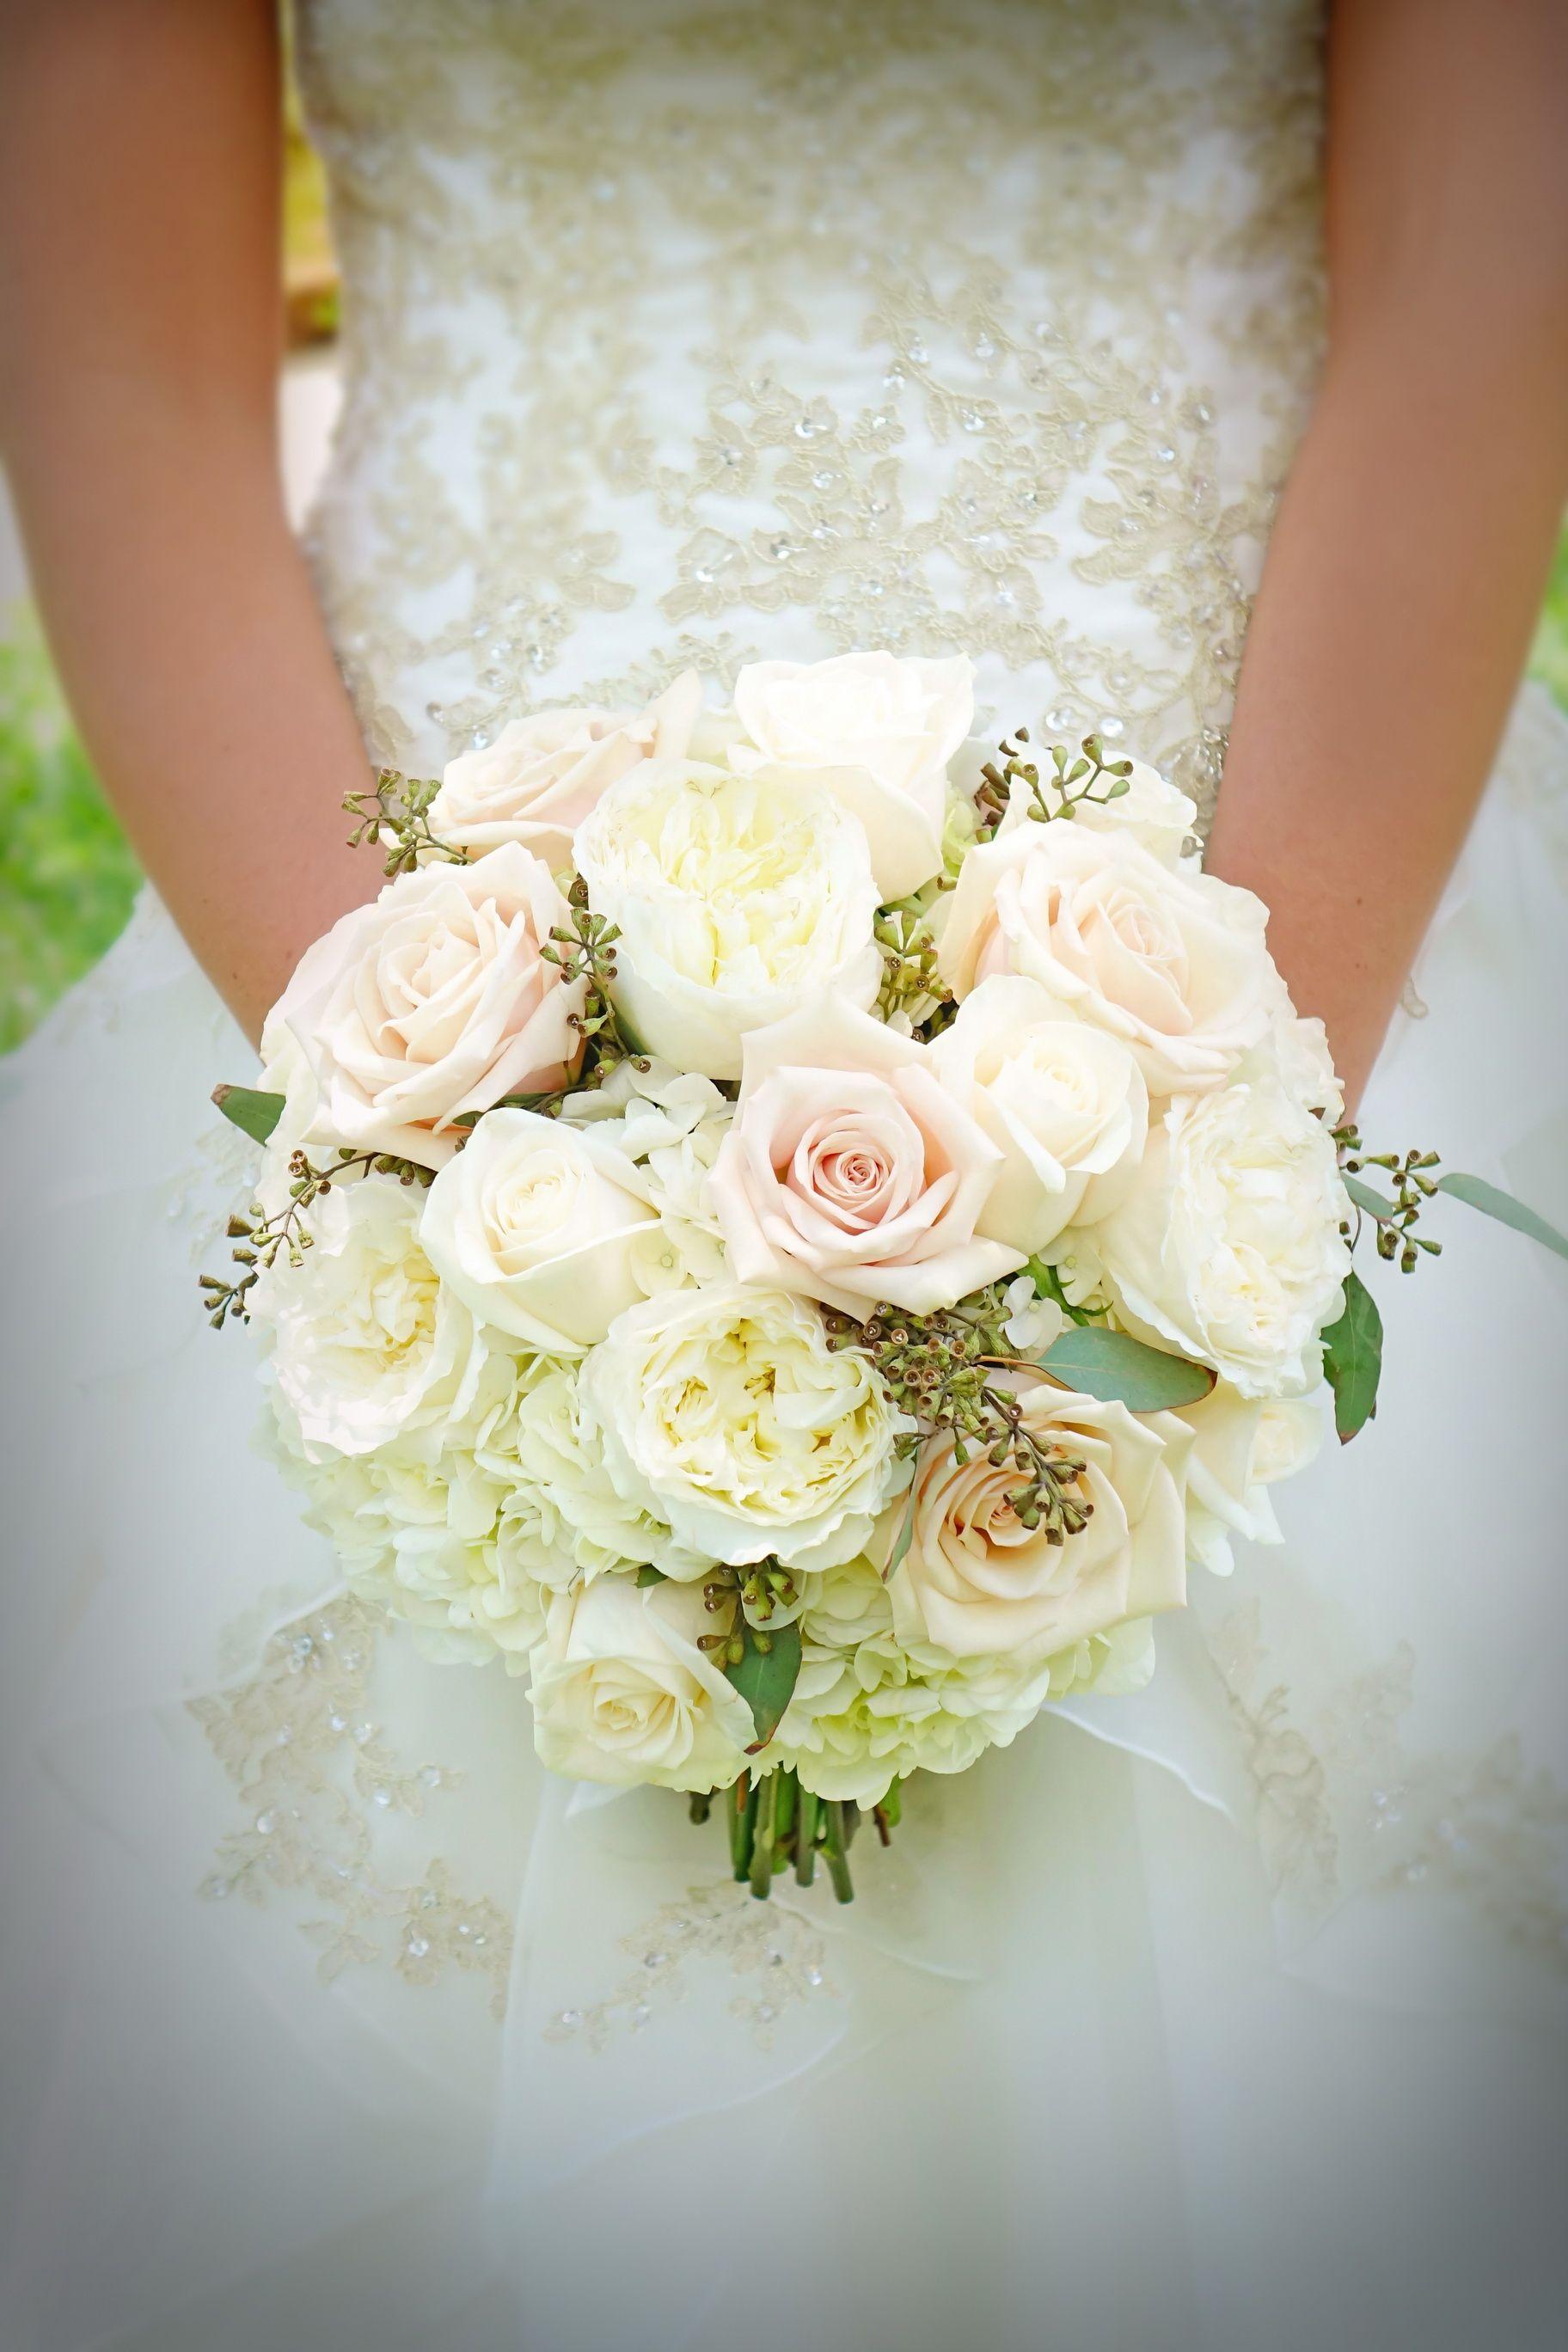 #outdoor wedding #beach wedding #gold wedding #light pink wedding #ivory rose bridal bouquet # garden bridal bouquet #Florida destination wedding